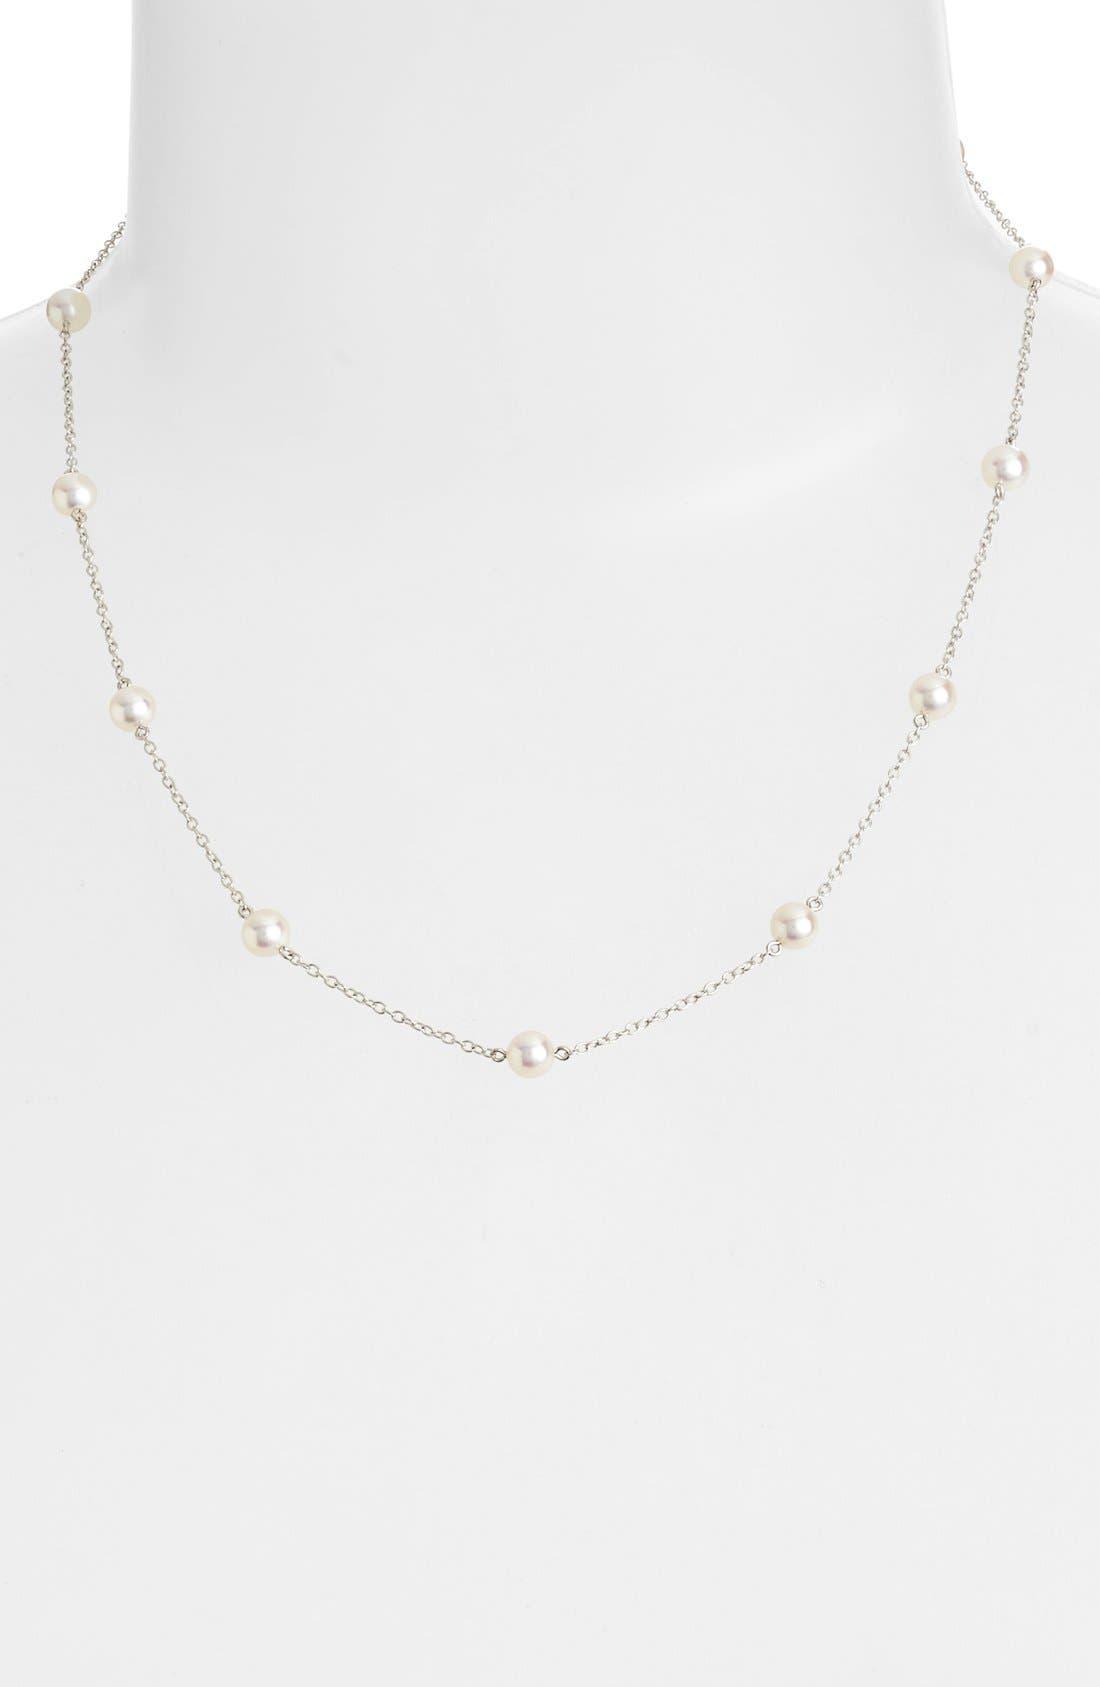 Chain & Pearl Necklace,                         Main,                         color, No Color